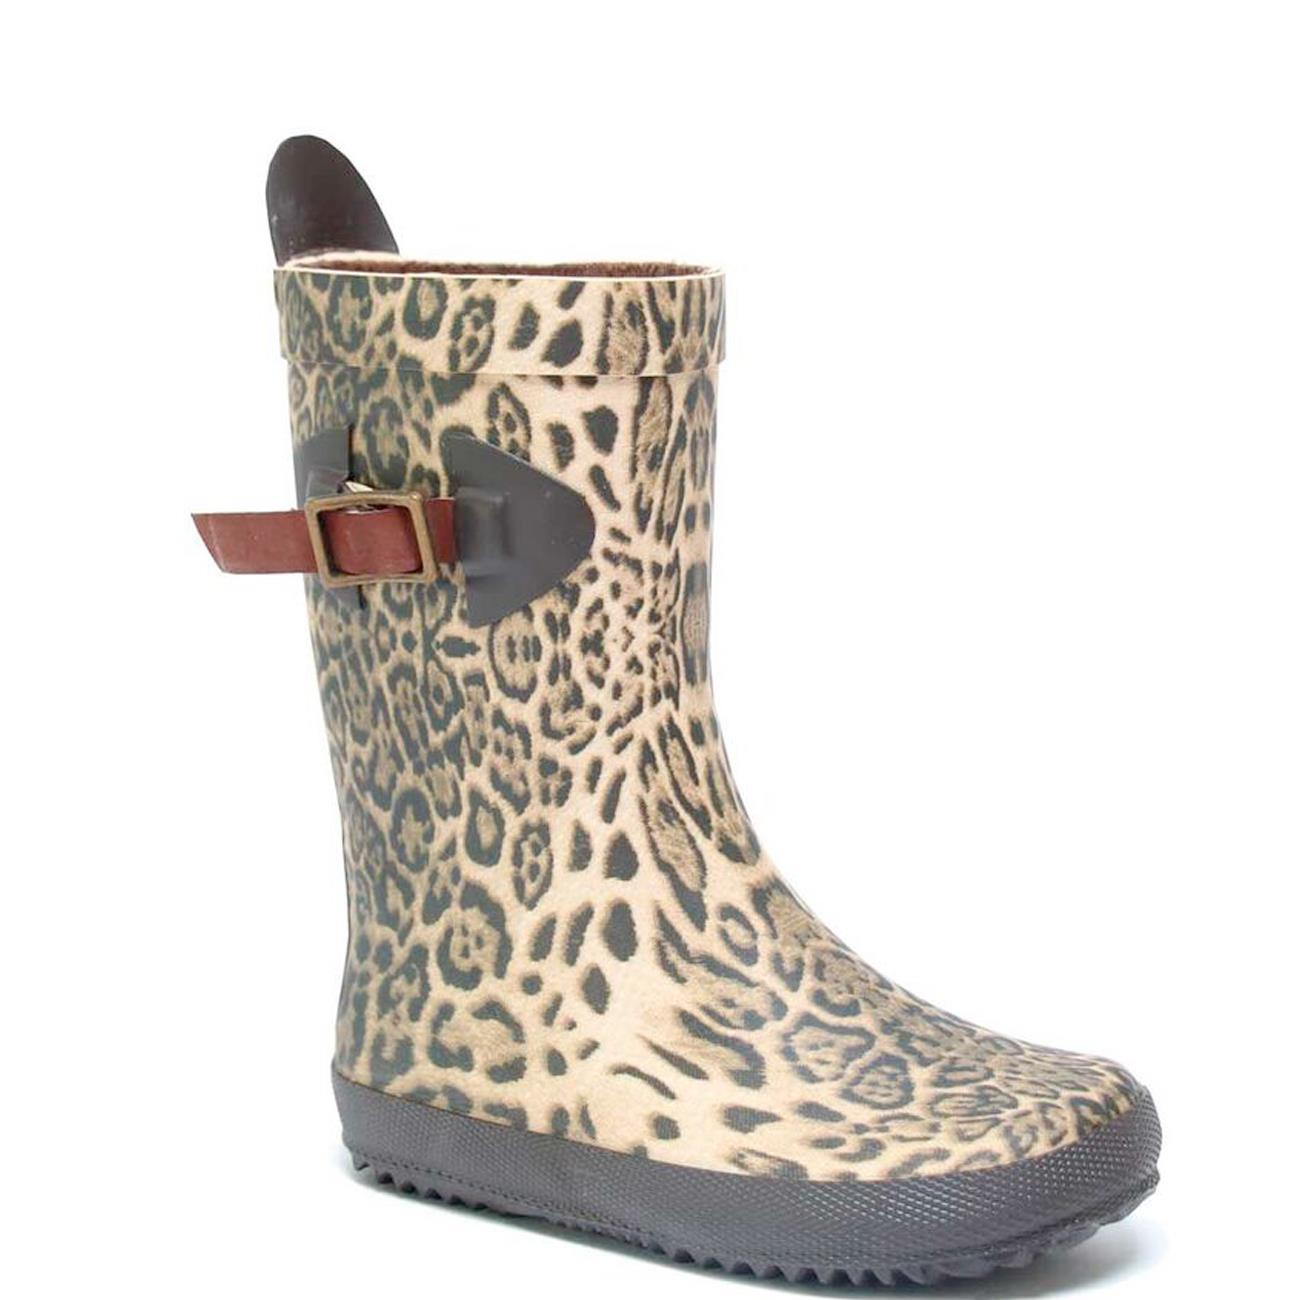 leopard rubber boots